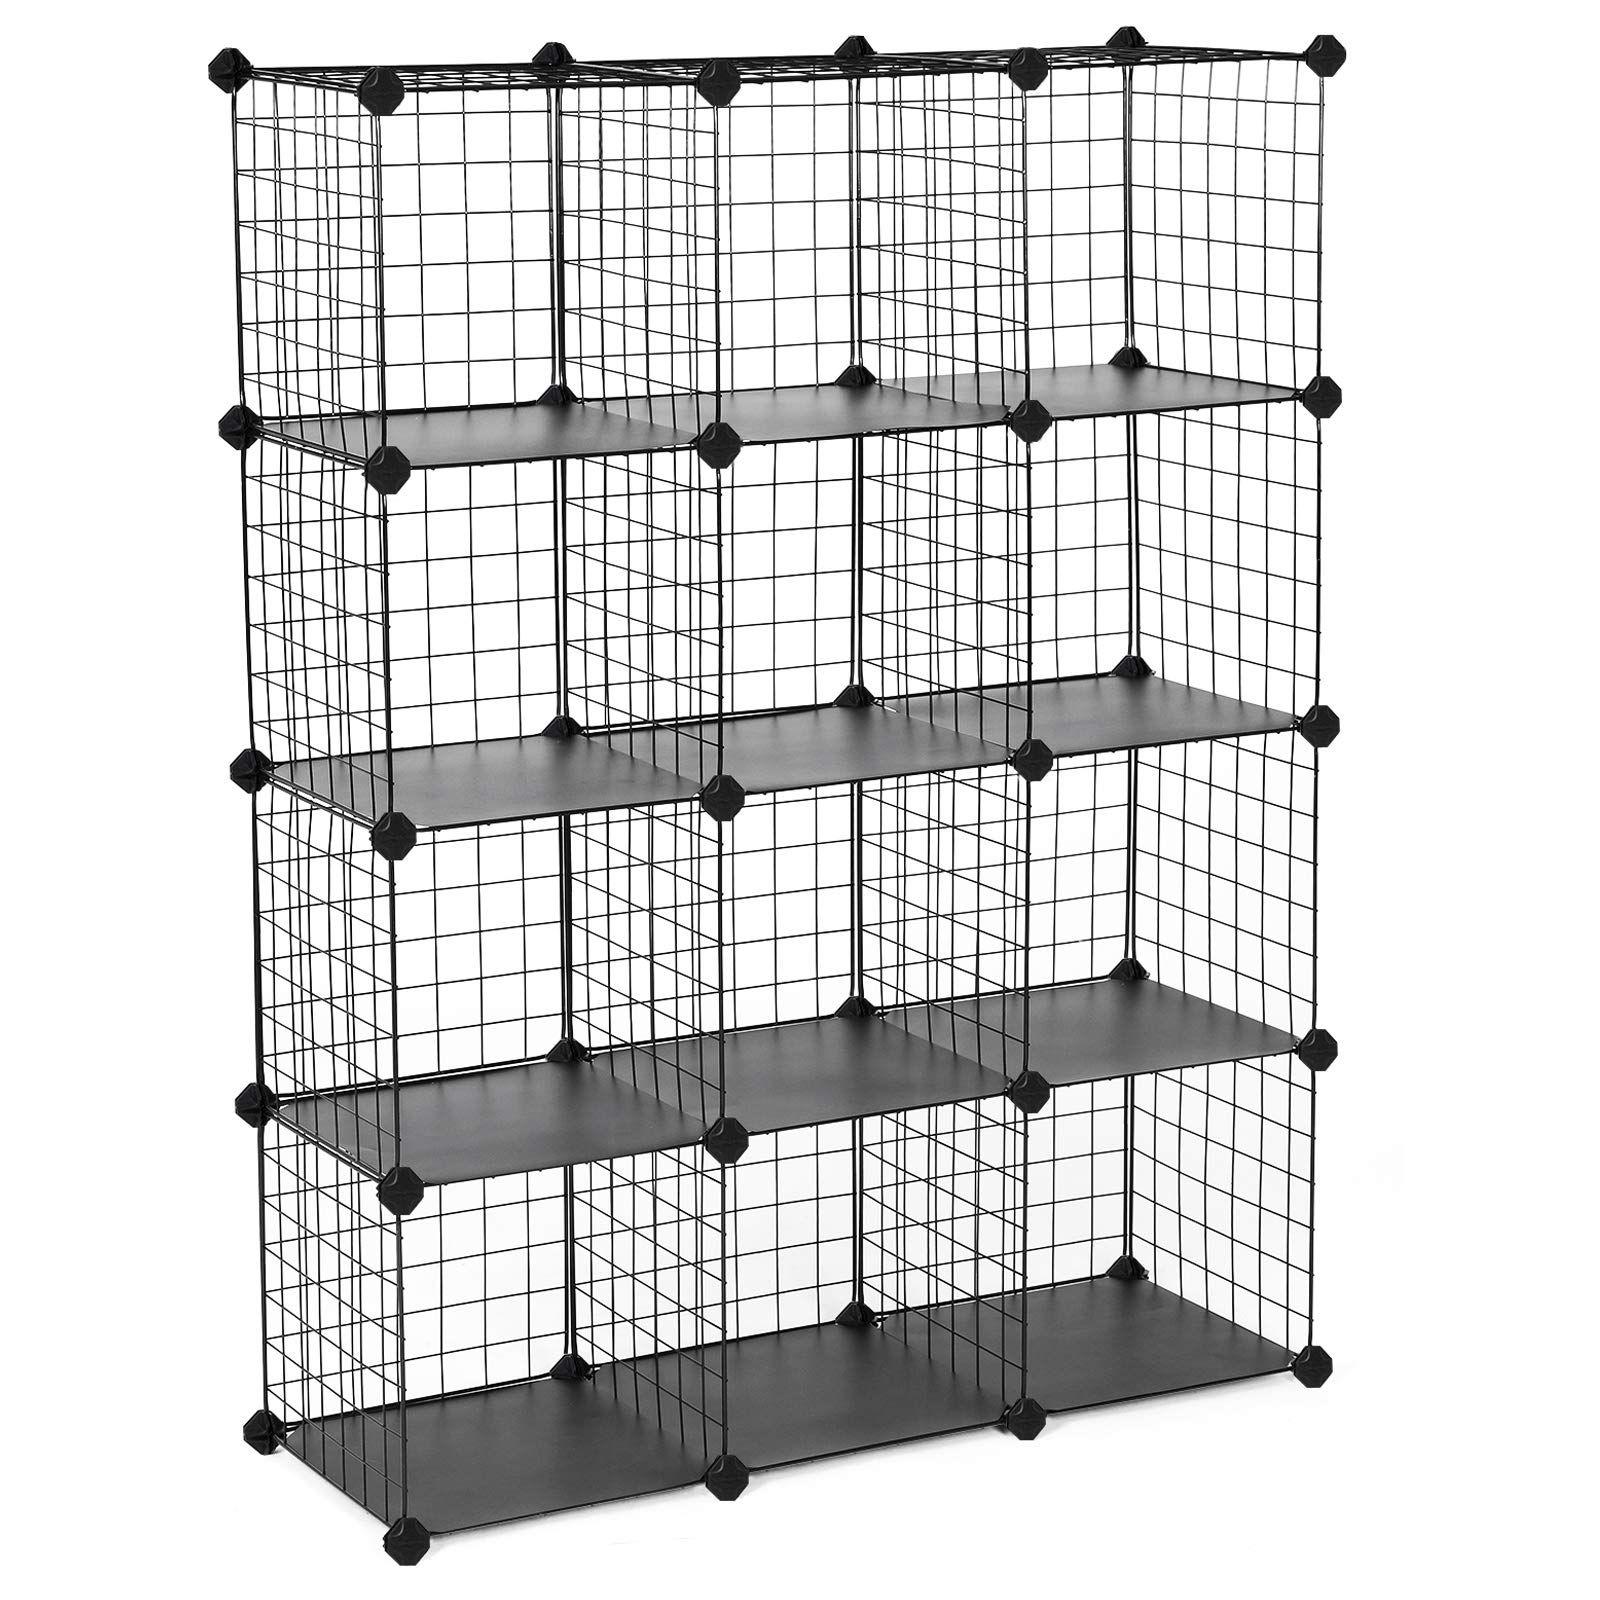 Songmics Metal Wire Cube Storage 12 Cube Shelves Organizer Stackable Storage Bins Modular Bookcase Diy Clos In 2020 Stackable Storage Bins Cube Storage Wire Shelving